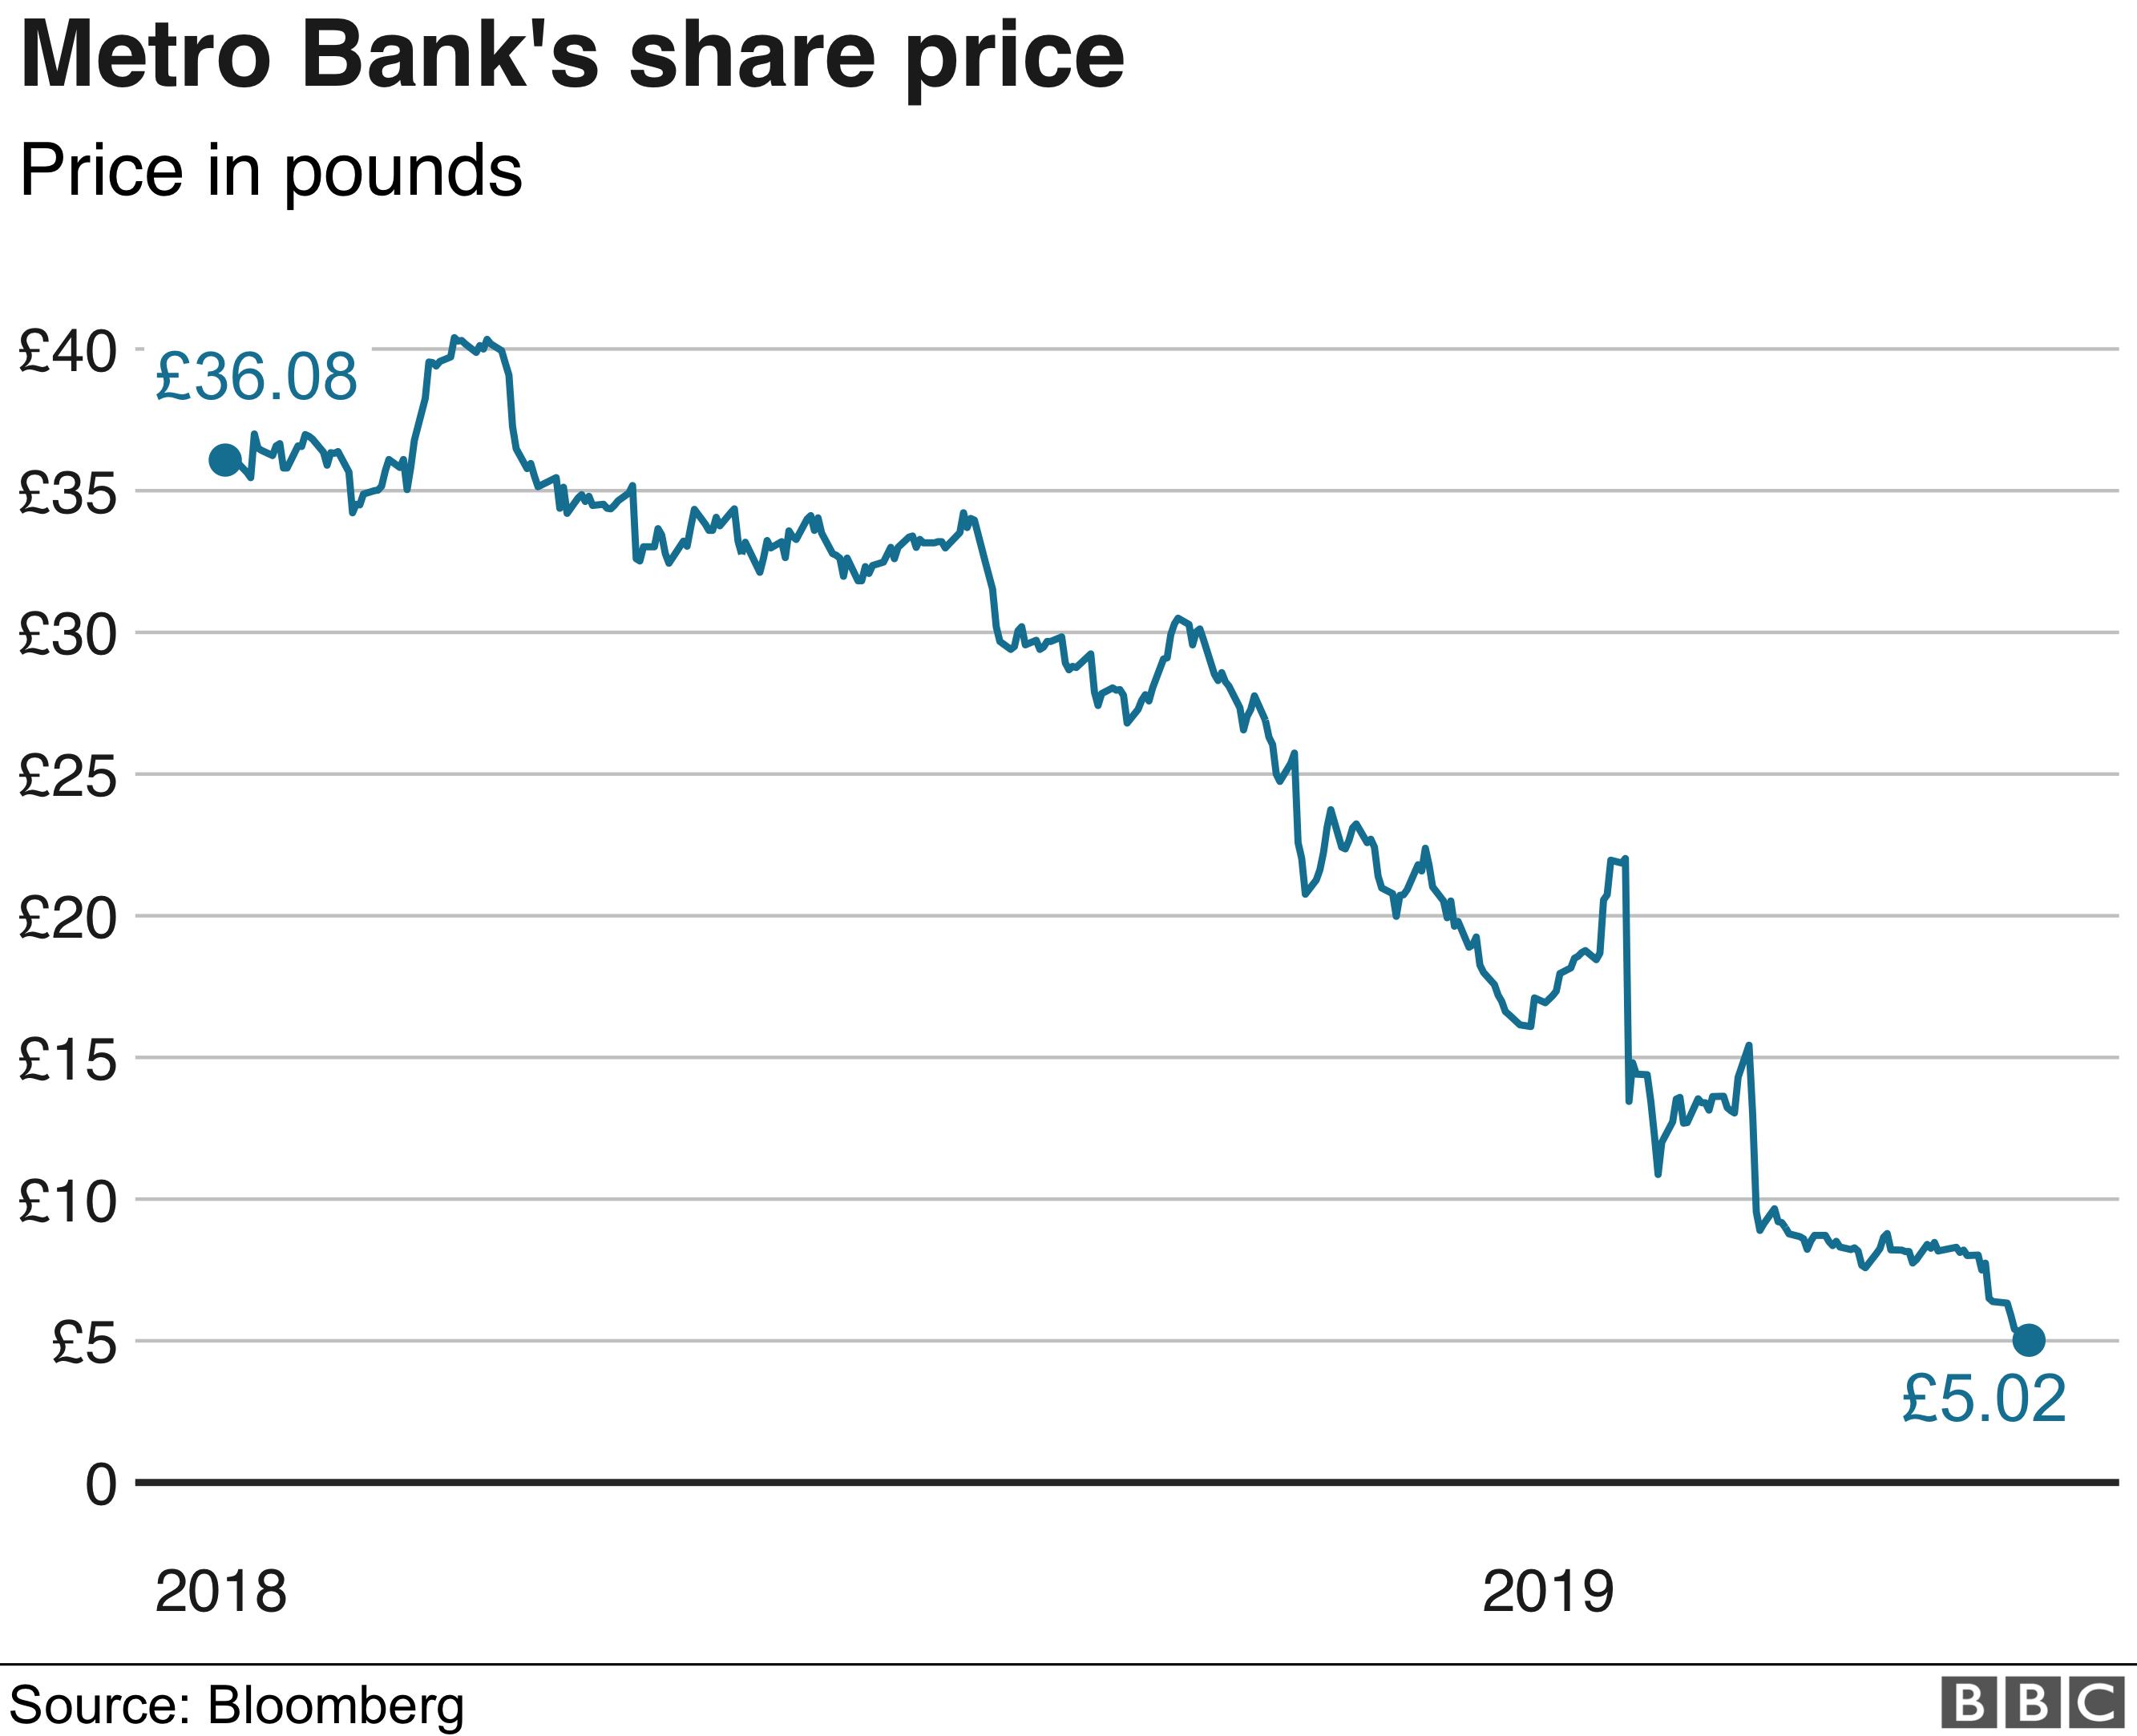 Metro Bank Philippines Share Price